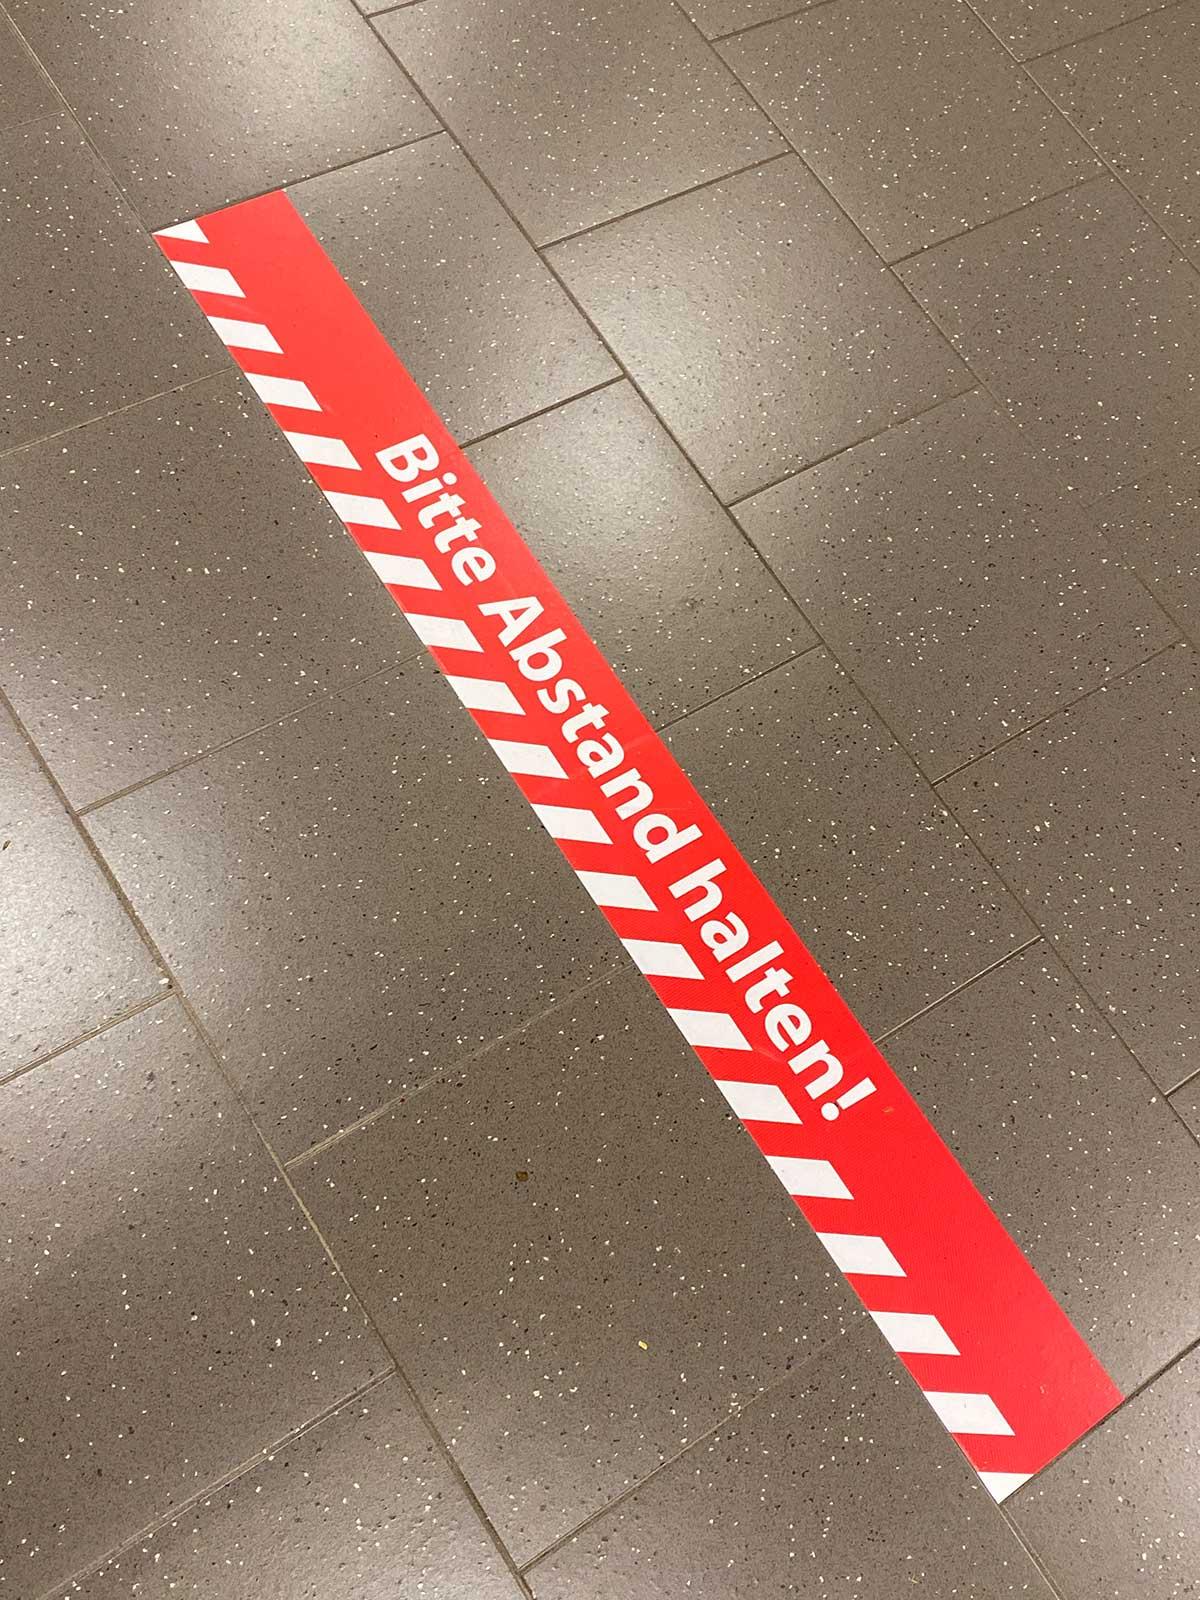 Fußbodenaufkleber - Abstand halten - Markierung